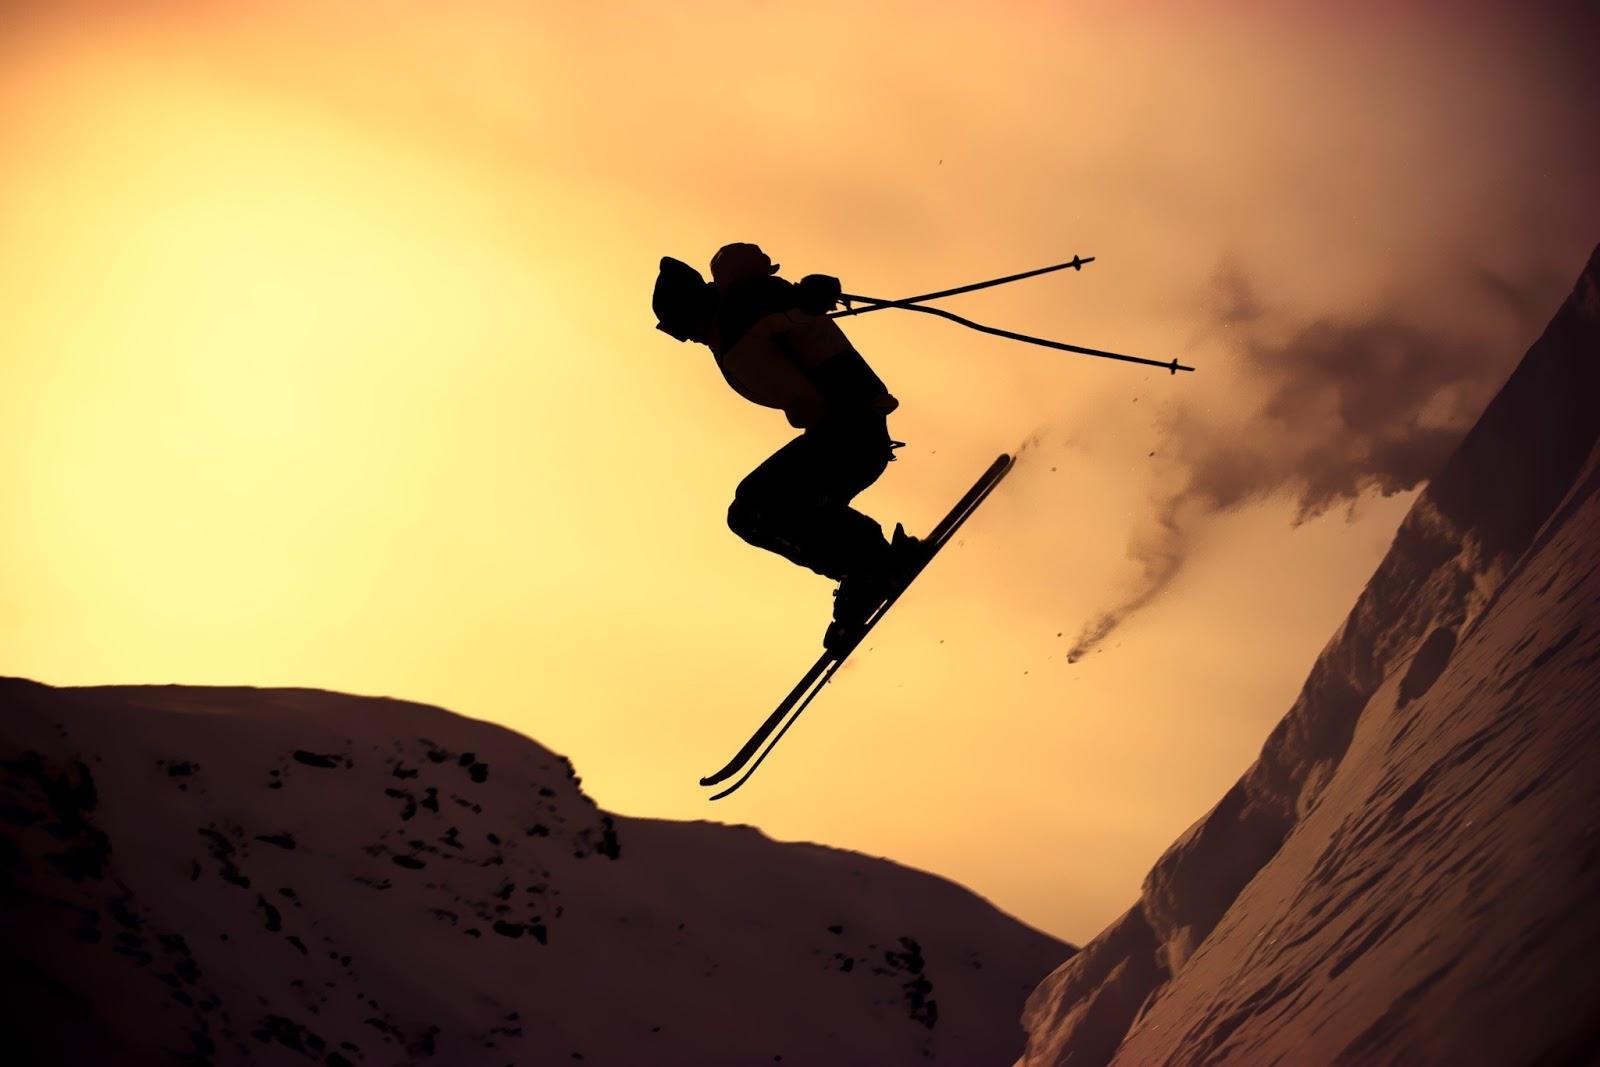 Hd wallpaper skiing hd wallpapers - Ski wallpaper ...